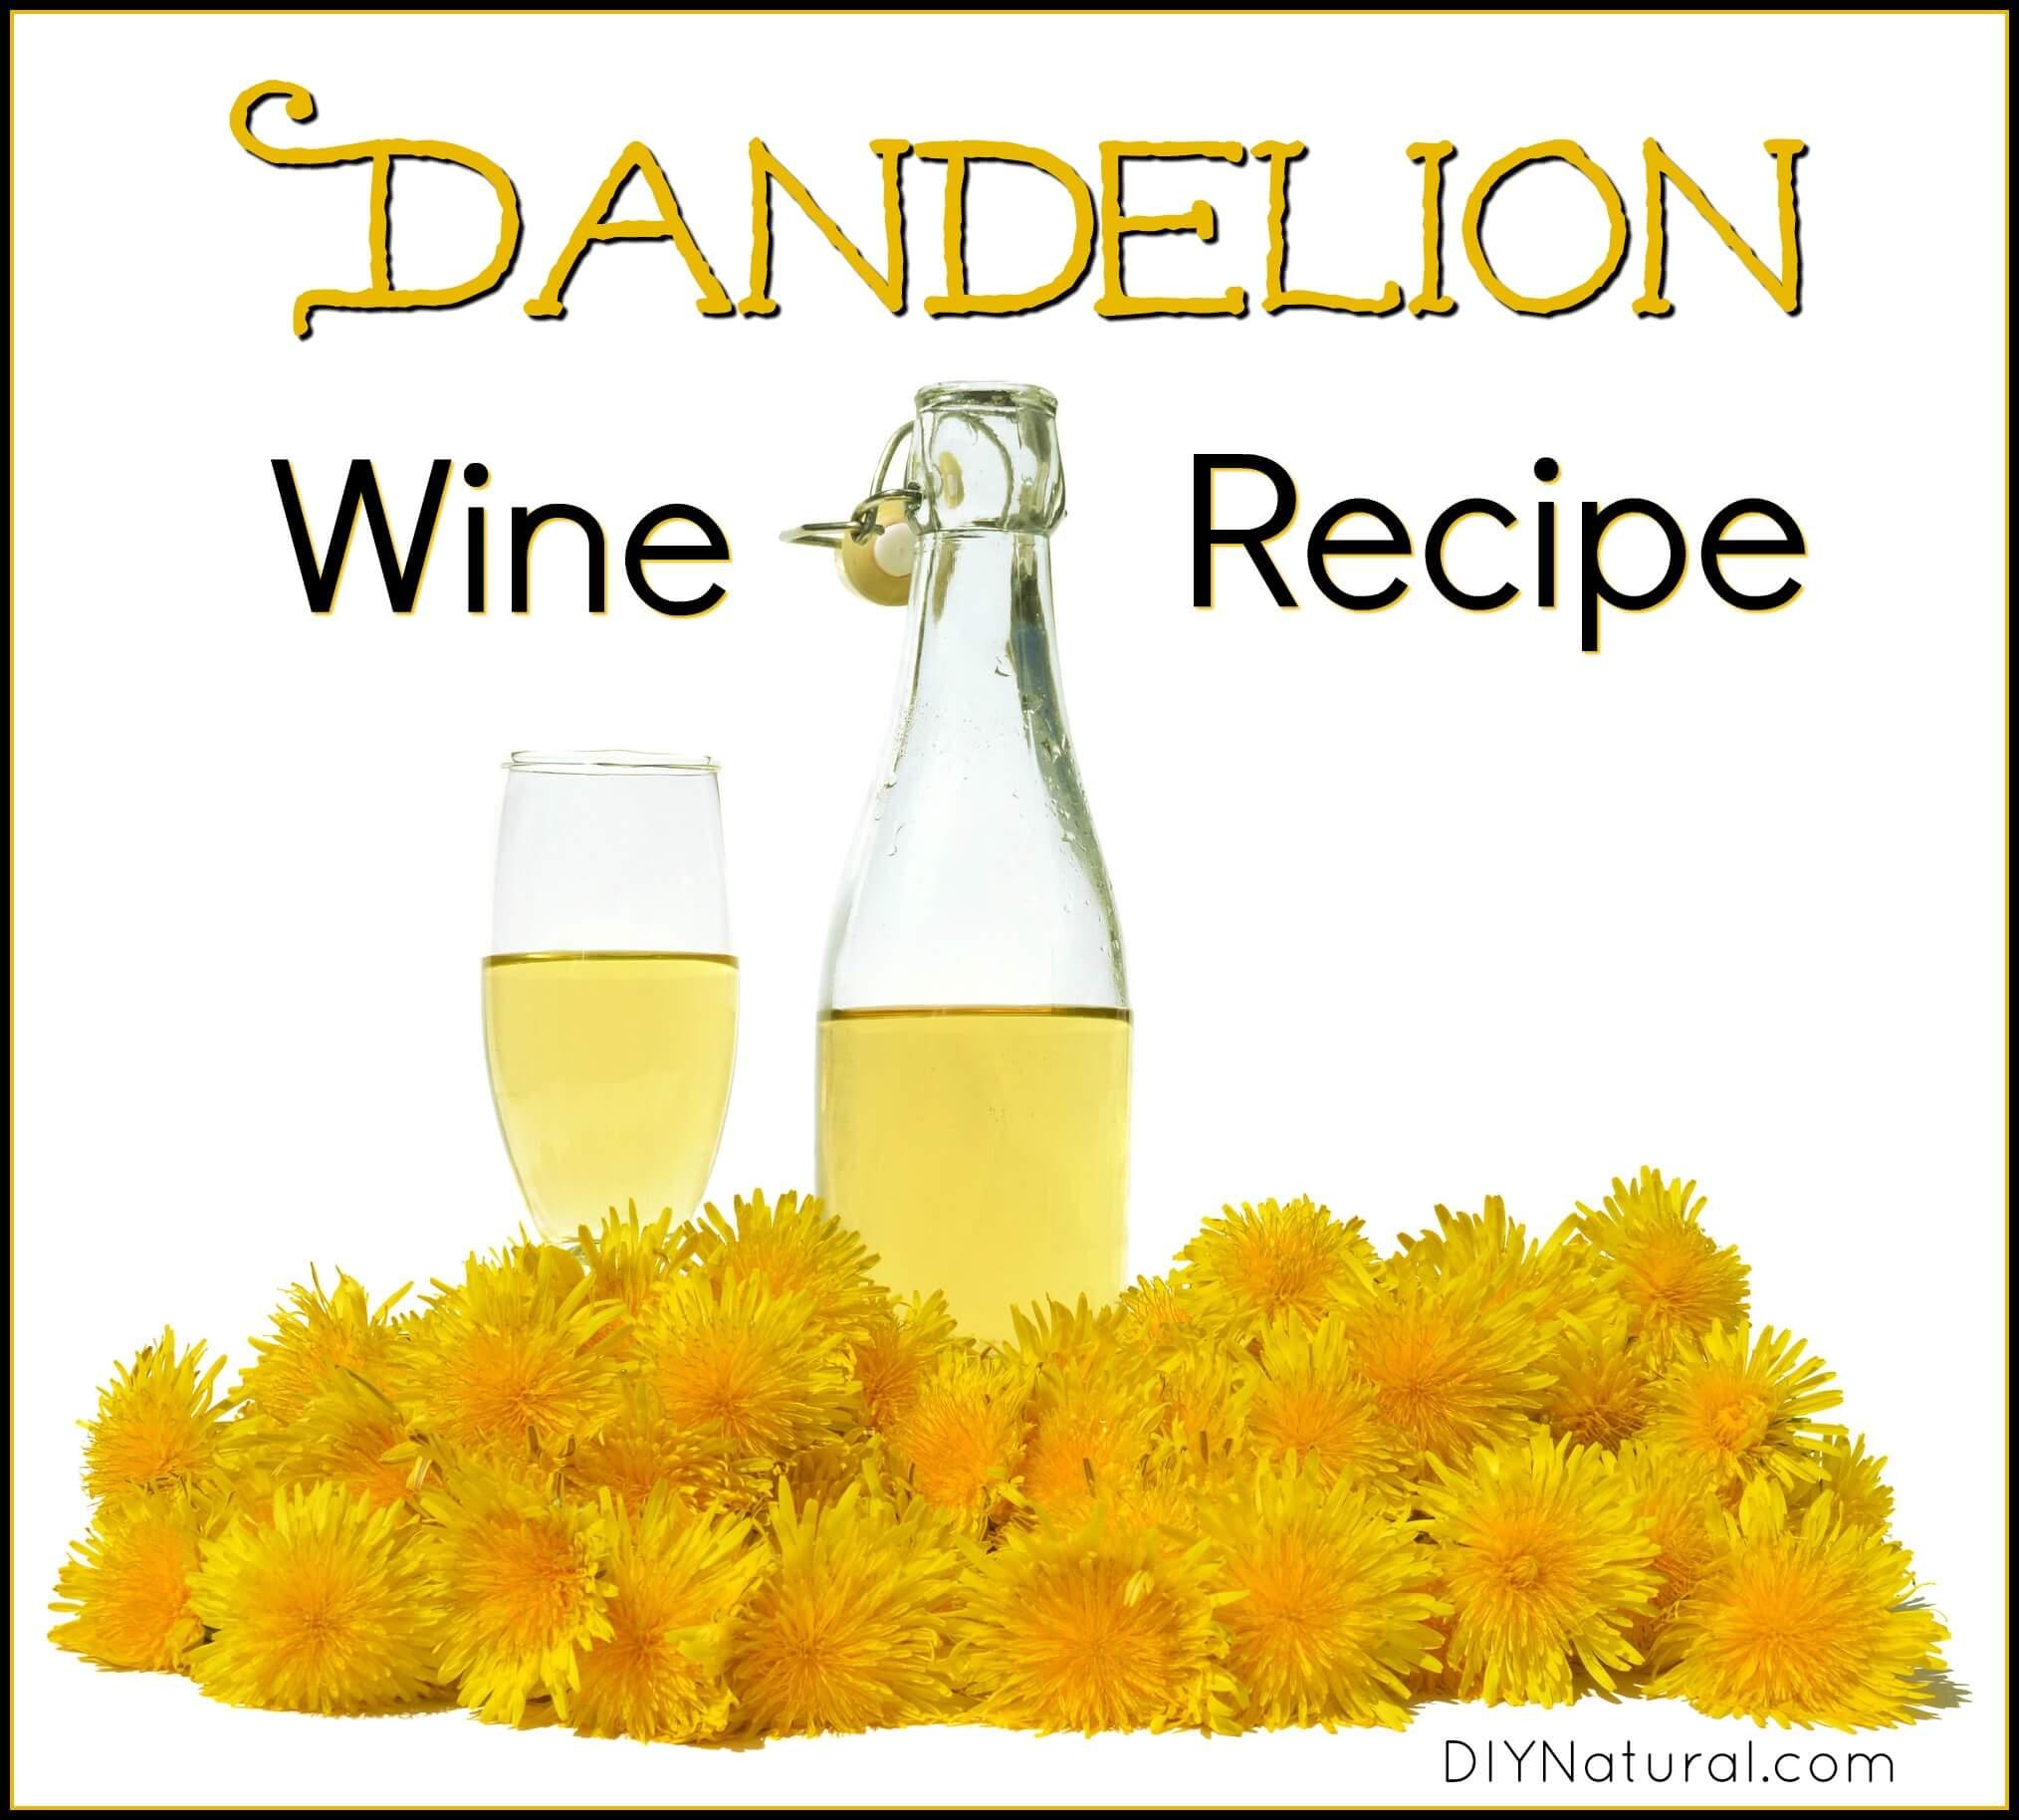 Wine from dandelions. Recipe for making homemade wine from dandelion flowers 25